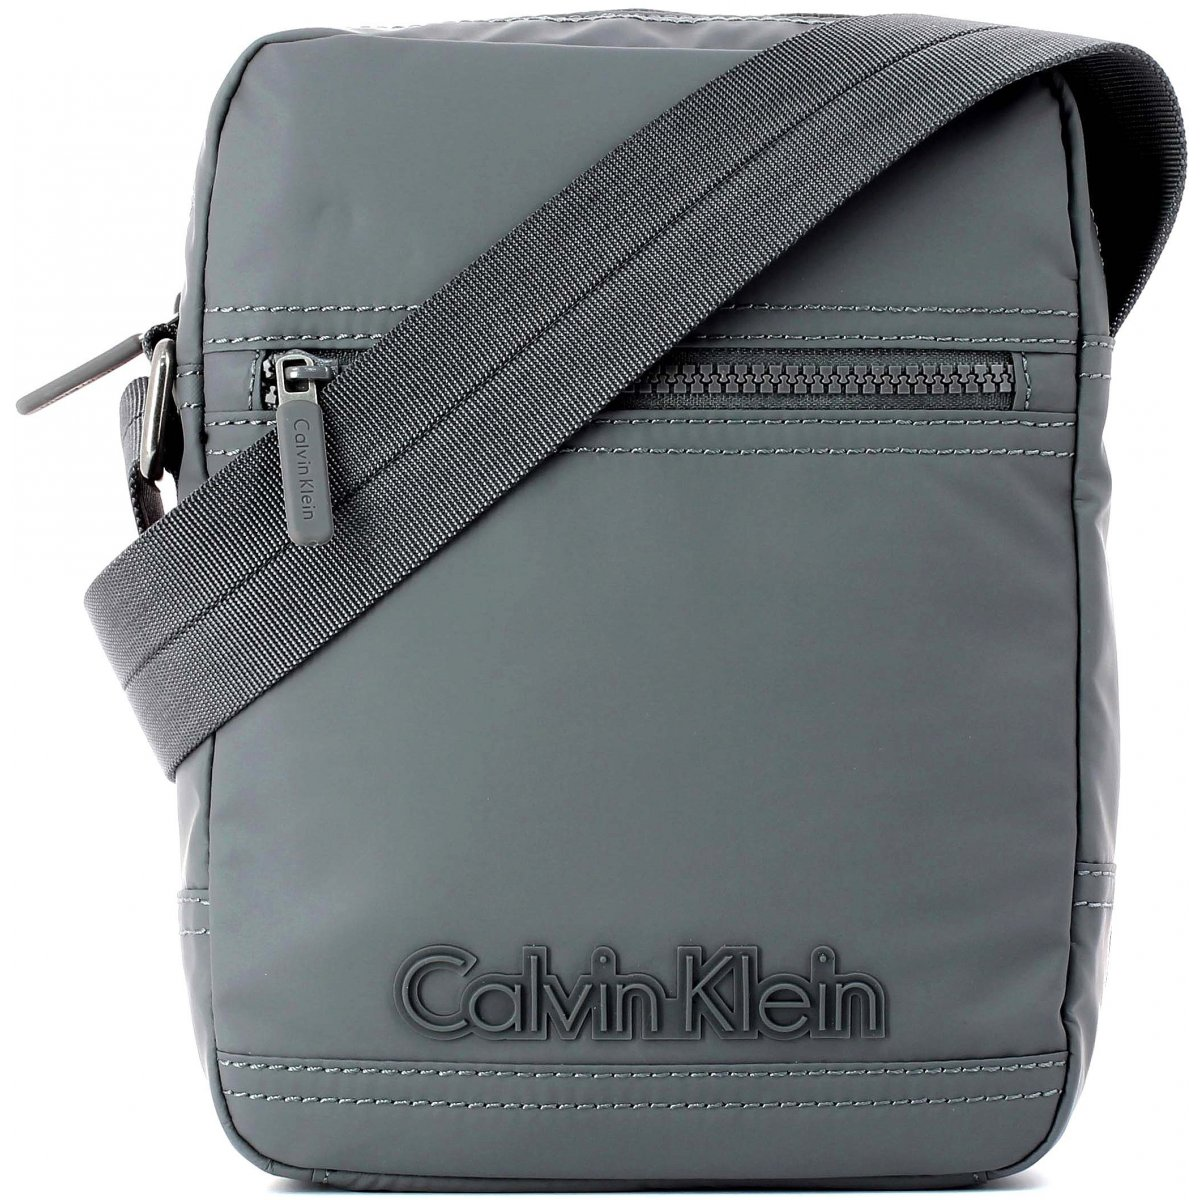 Homme Couleur K500718 Sac Calvin Klein Principale Bandoulière b7gyvf6Y